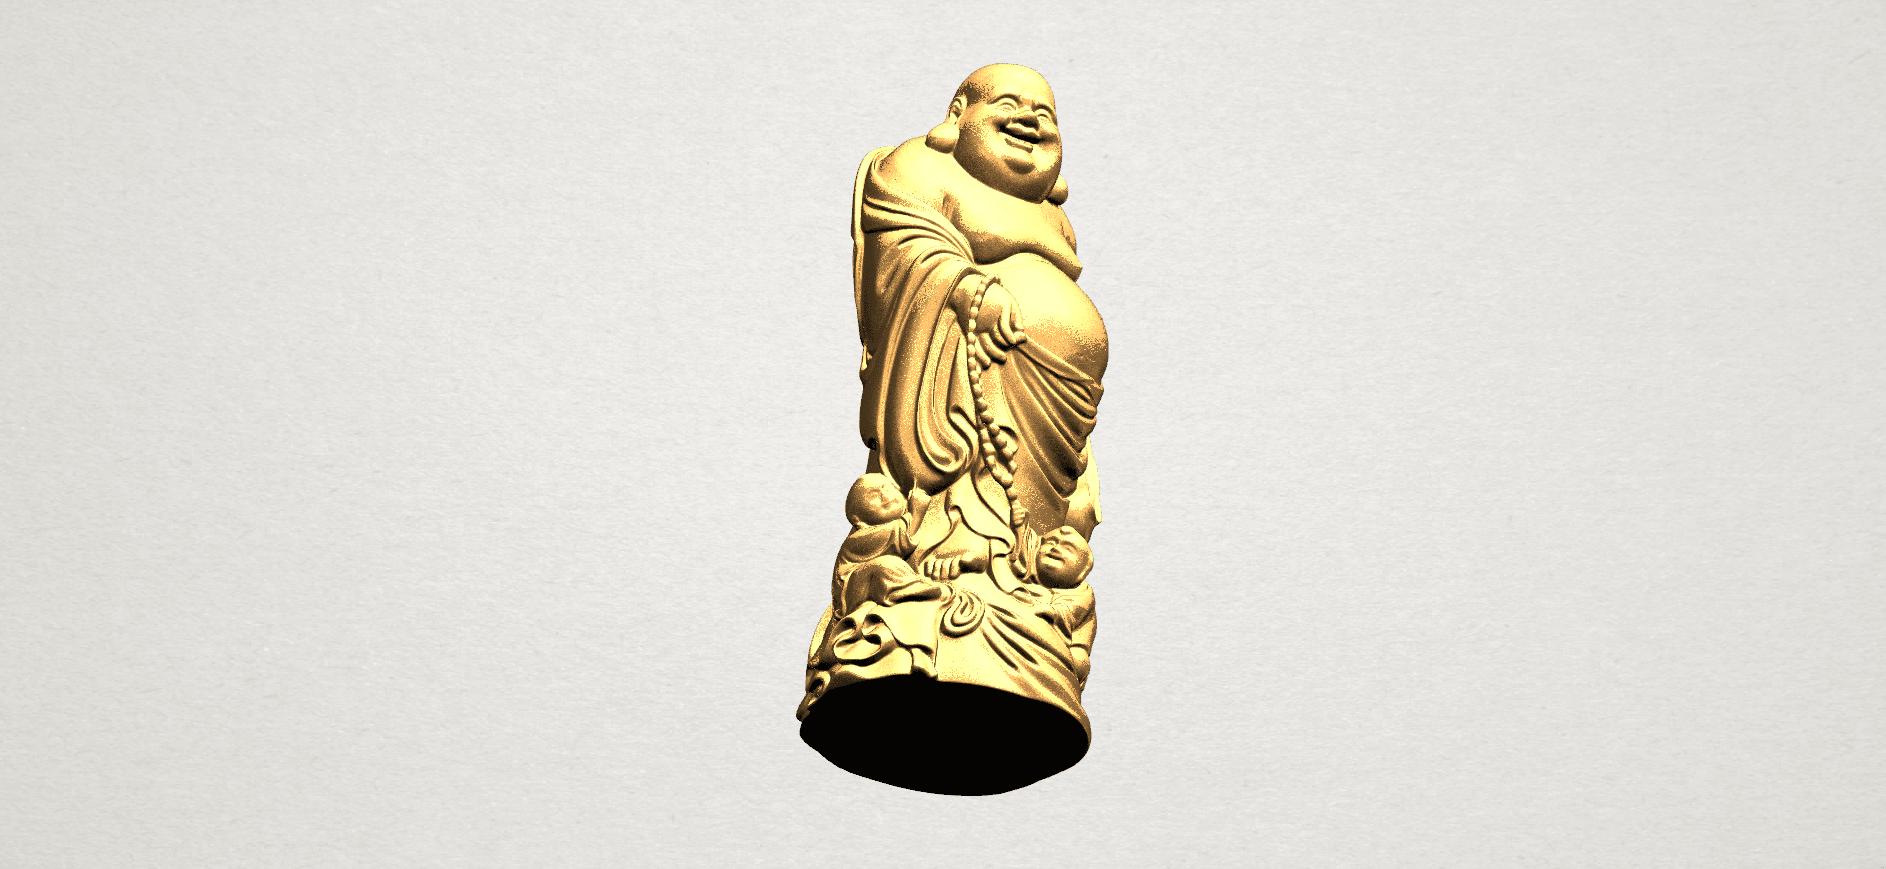 TDA0070 Metteyya Buddha 03 - 88mm - A09.png Download free STL file Metteyya Buddha 03 • 3D printing object, GeorgesNikkei